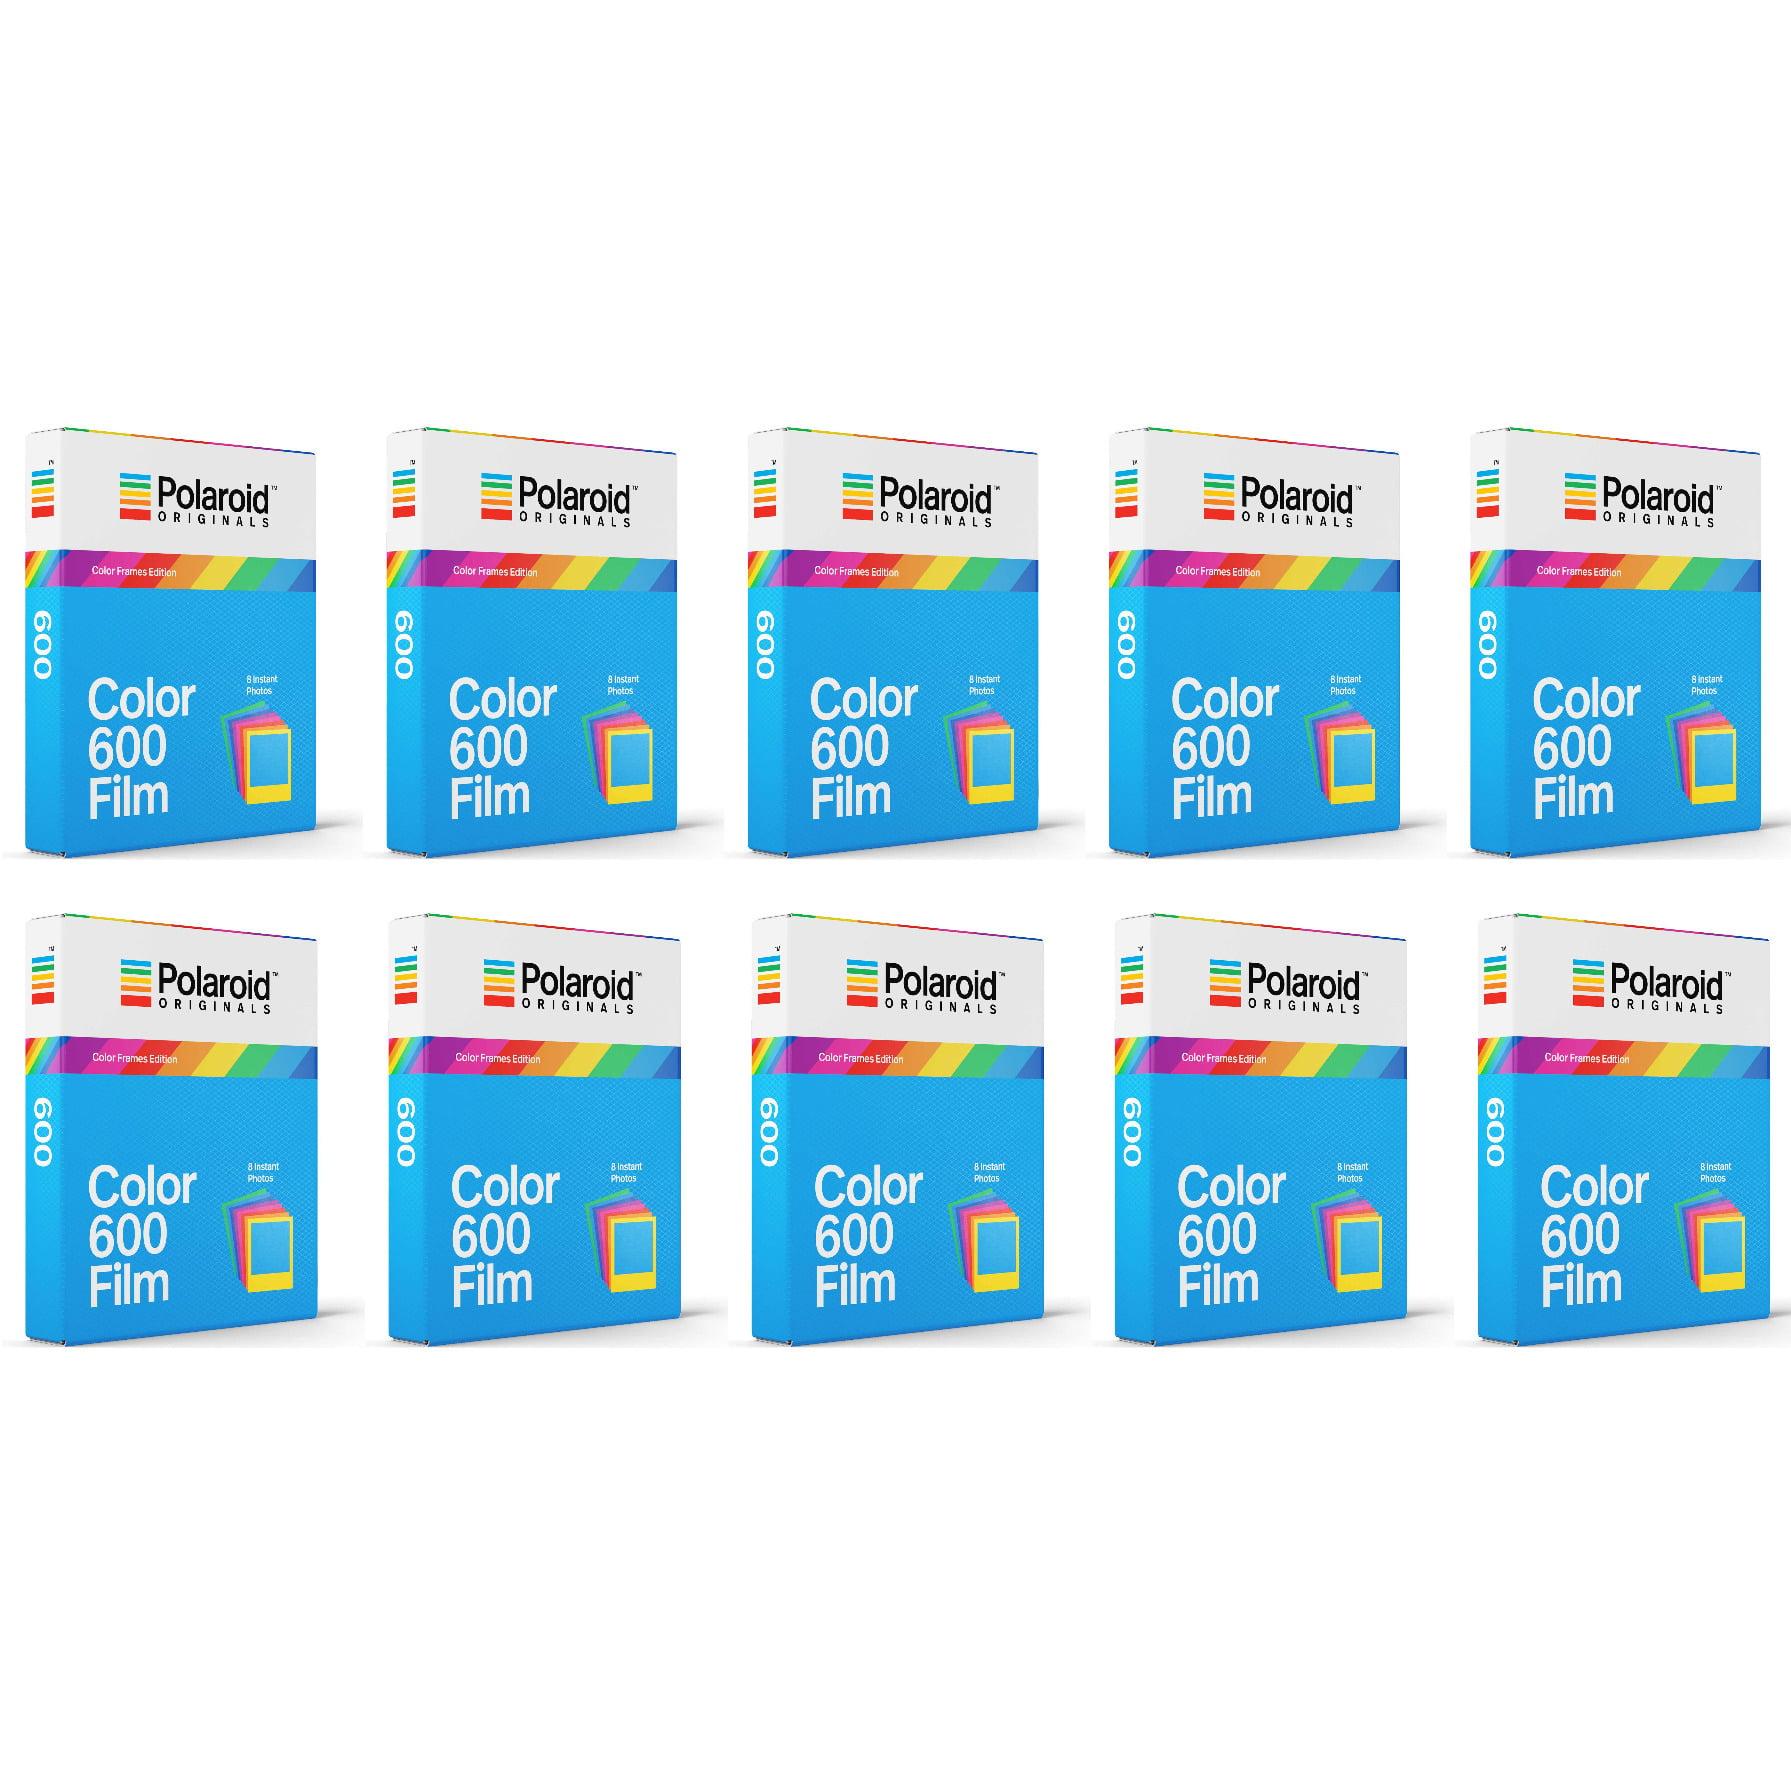 Polaroid Originals Instant Color Film for Color Frames (600 Camera) 10 Pack by Polaroid Originals